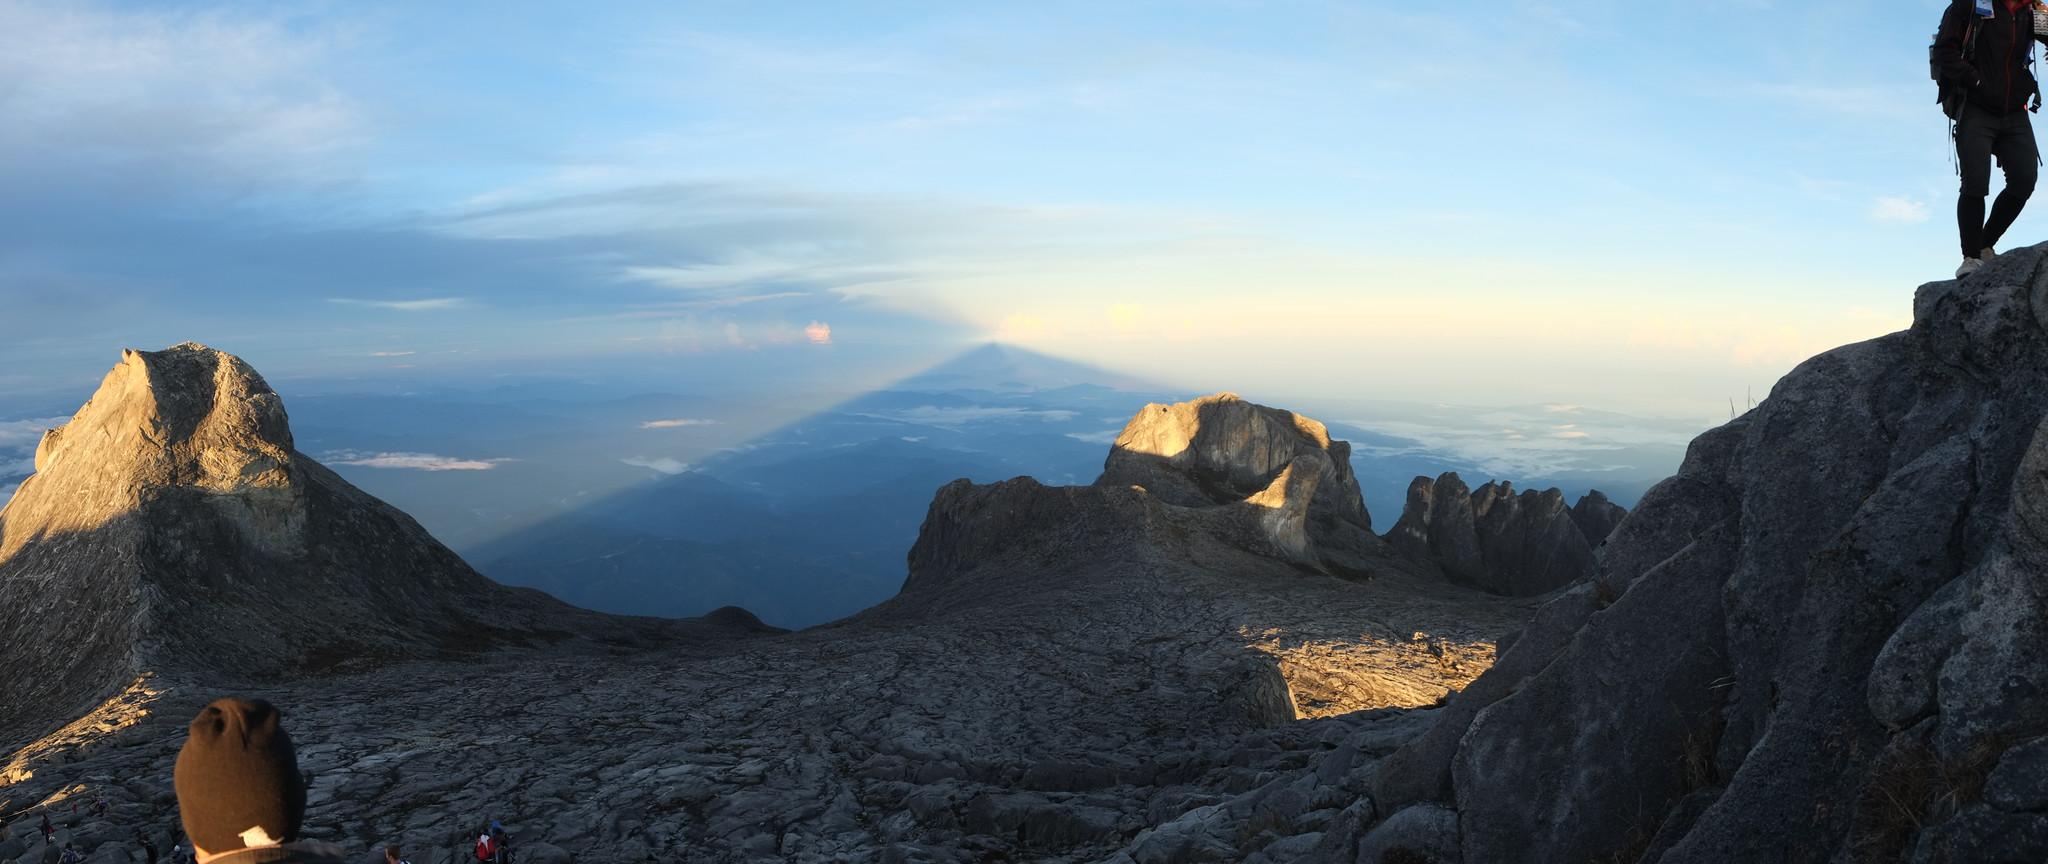 Panoramic - shadow crossing in the horizon on the dark side of Low's Peak